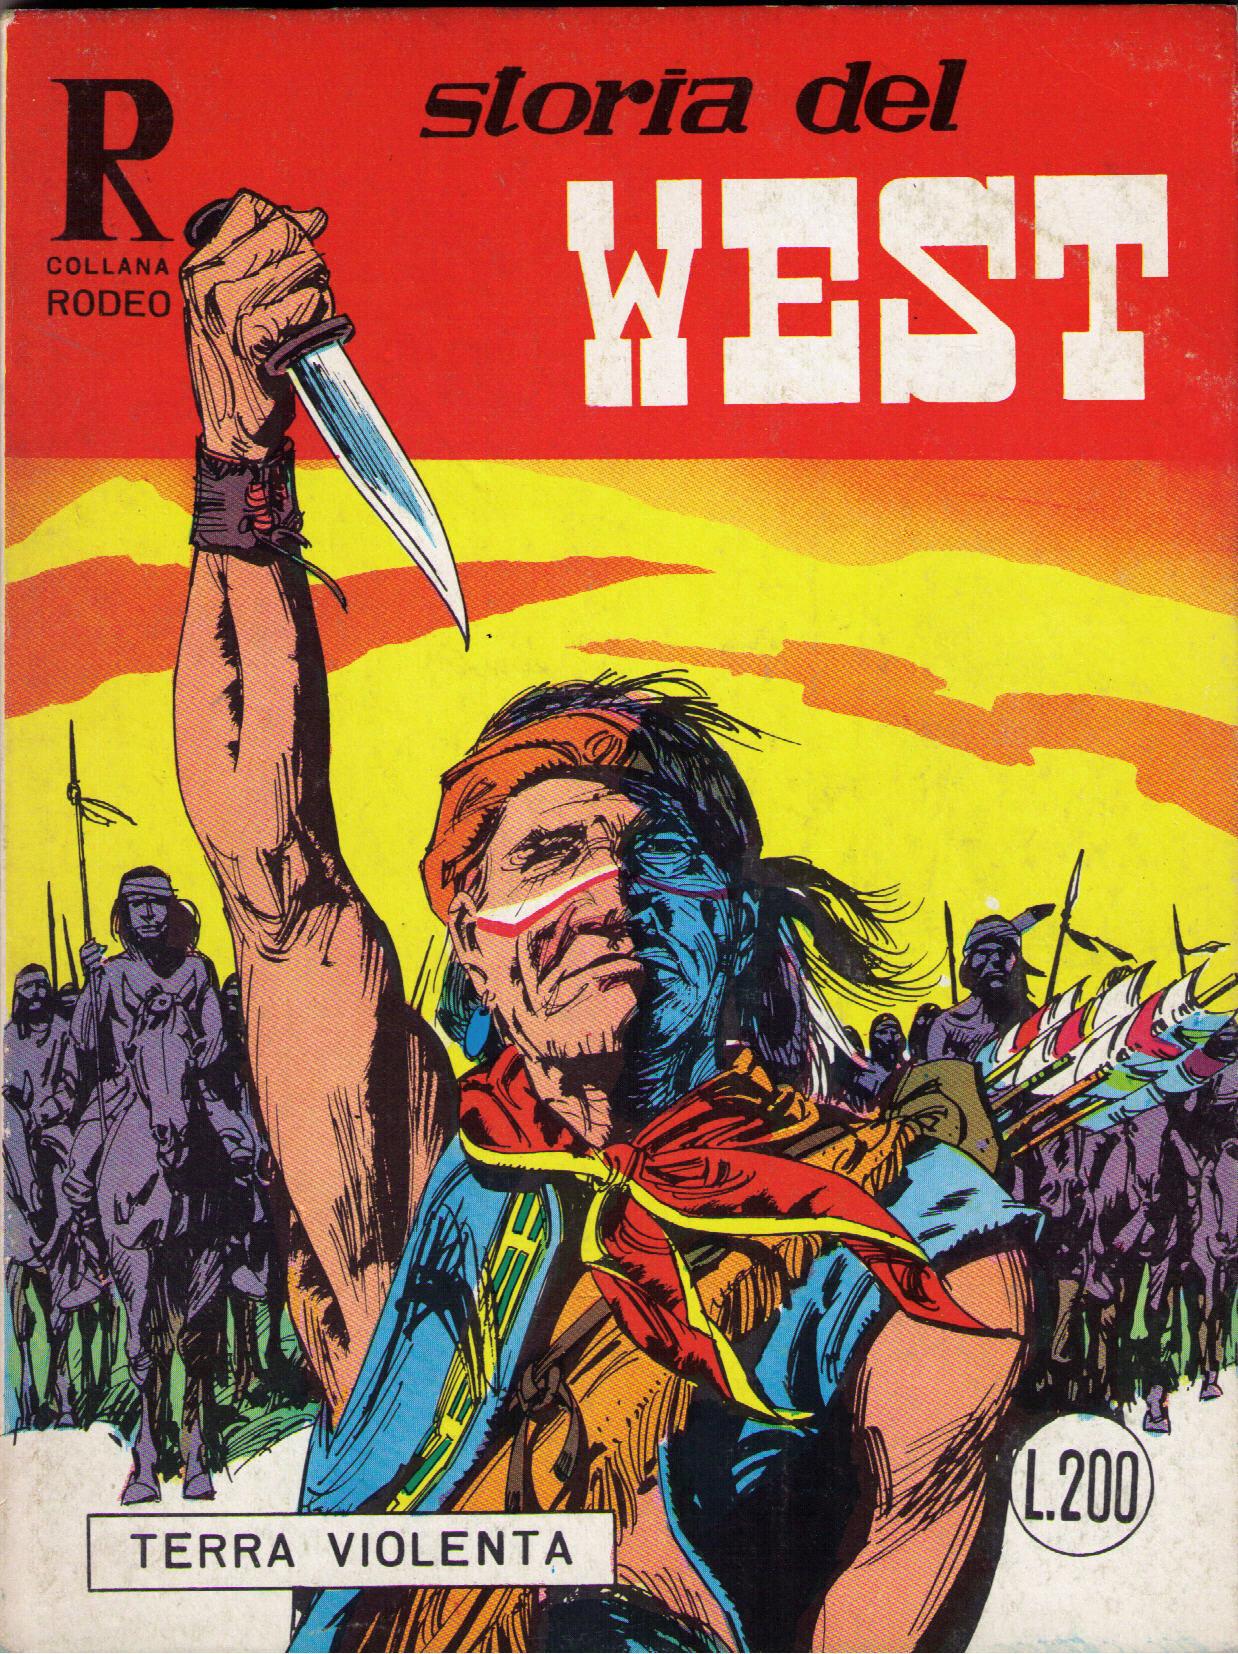 Storia del west n. 21 (collana Rodeo n. 45)